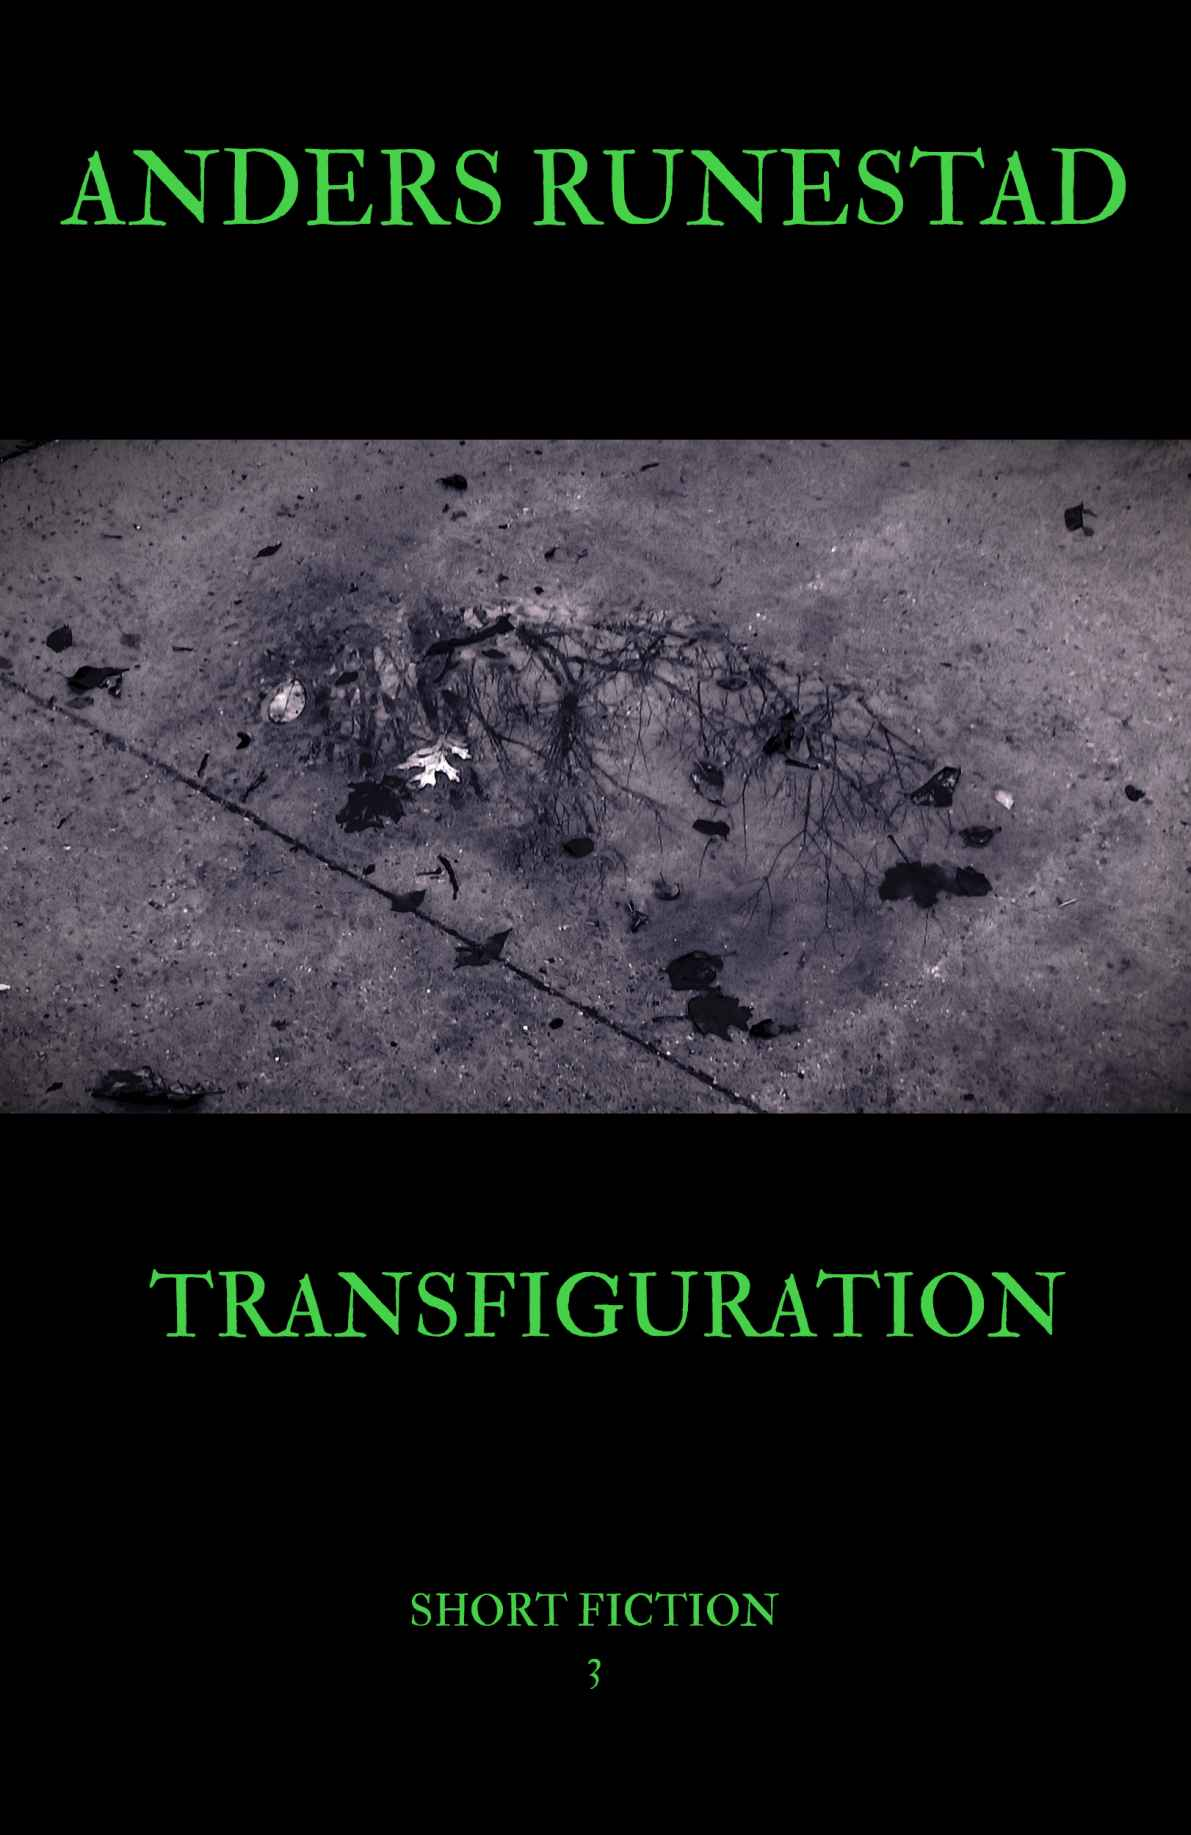 (4) Transfiguration